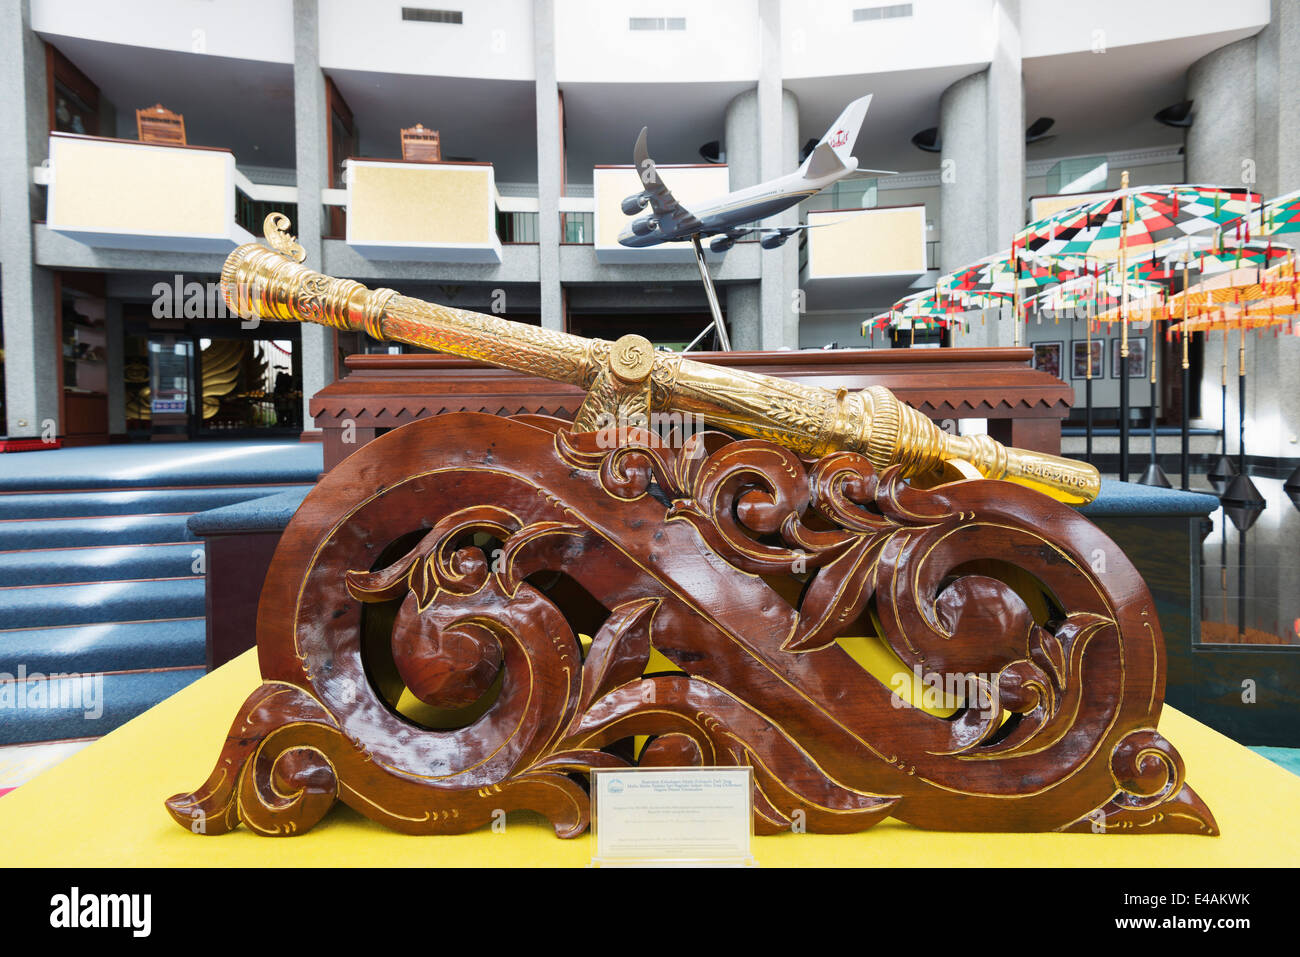 South East Asia, Kingdom of Brunei, Bandar Seri Begawan, Royal Regalia Museum - Stock Image